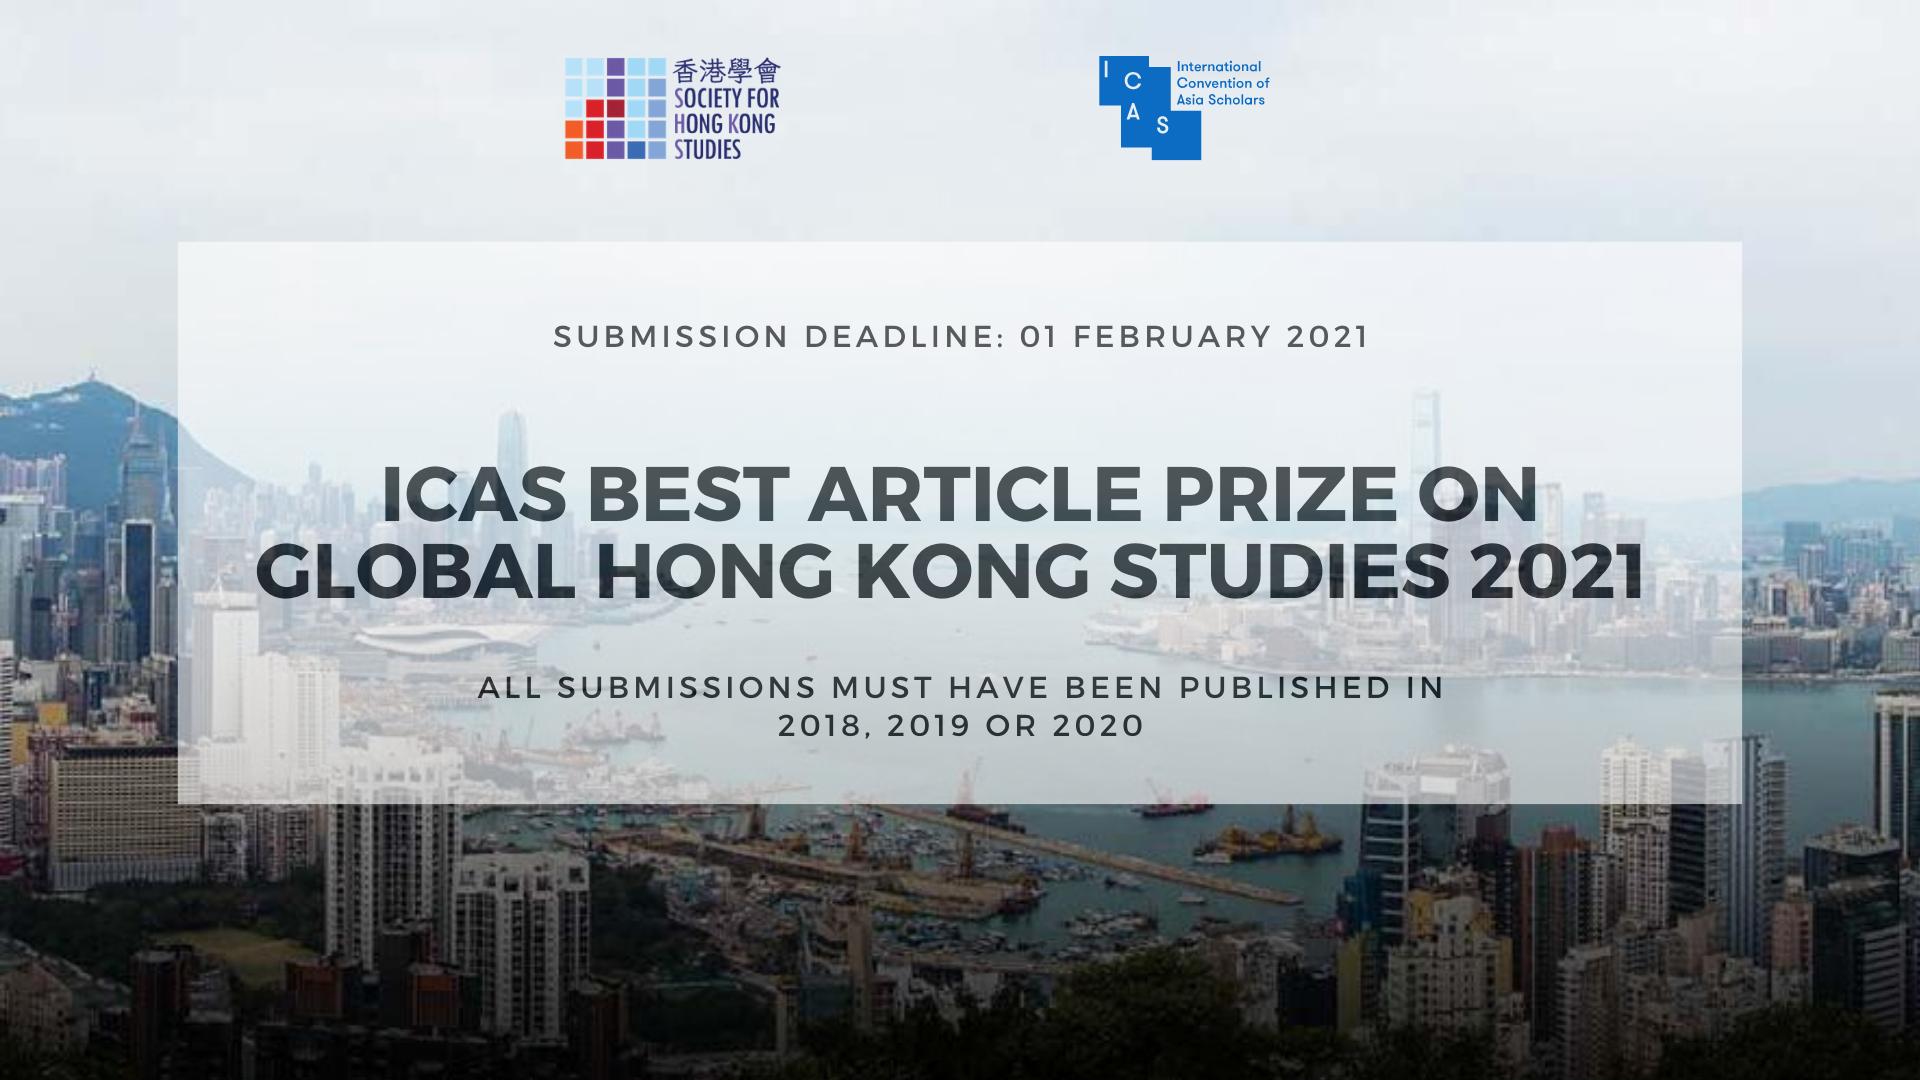 ICAS Best Article Prize on Global Hong Kong Studies 2021